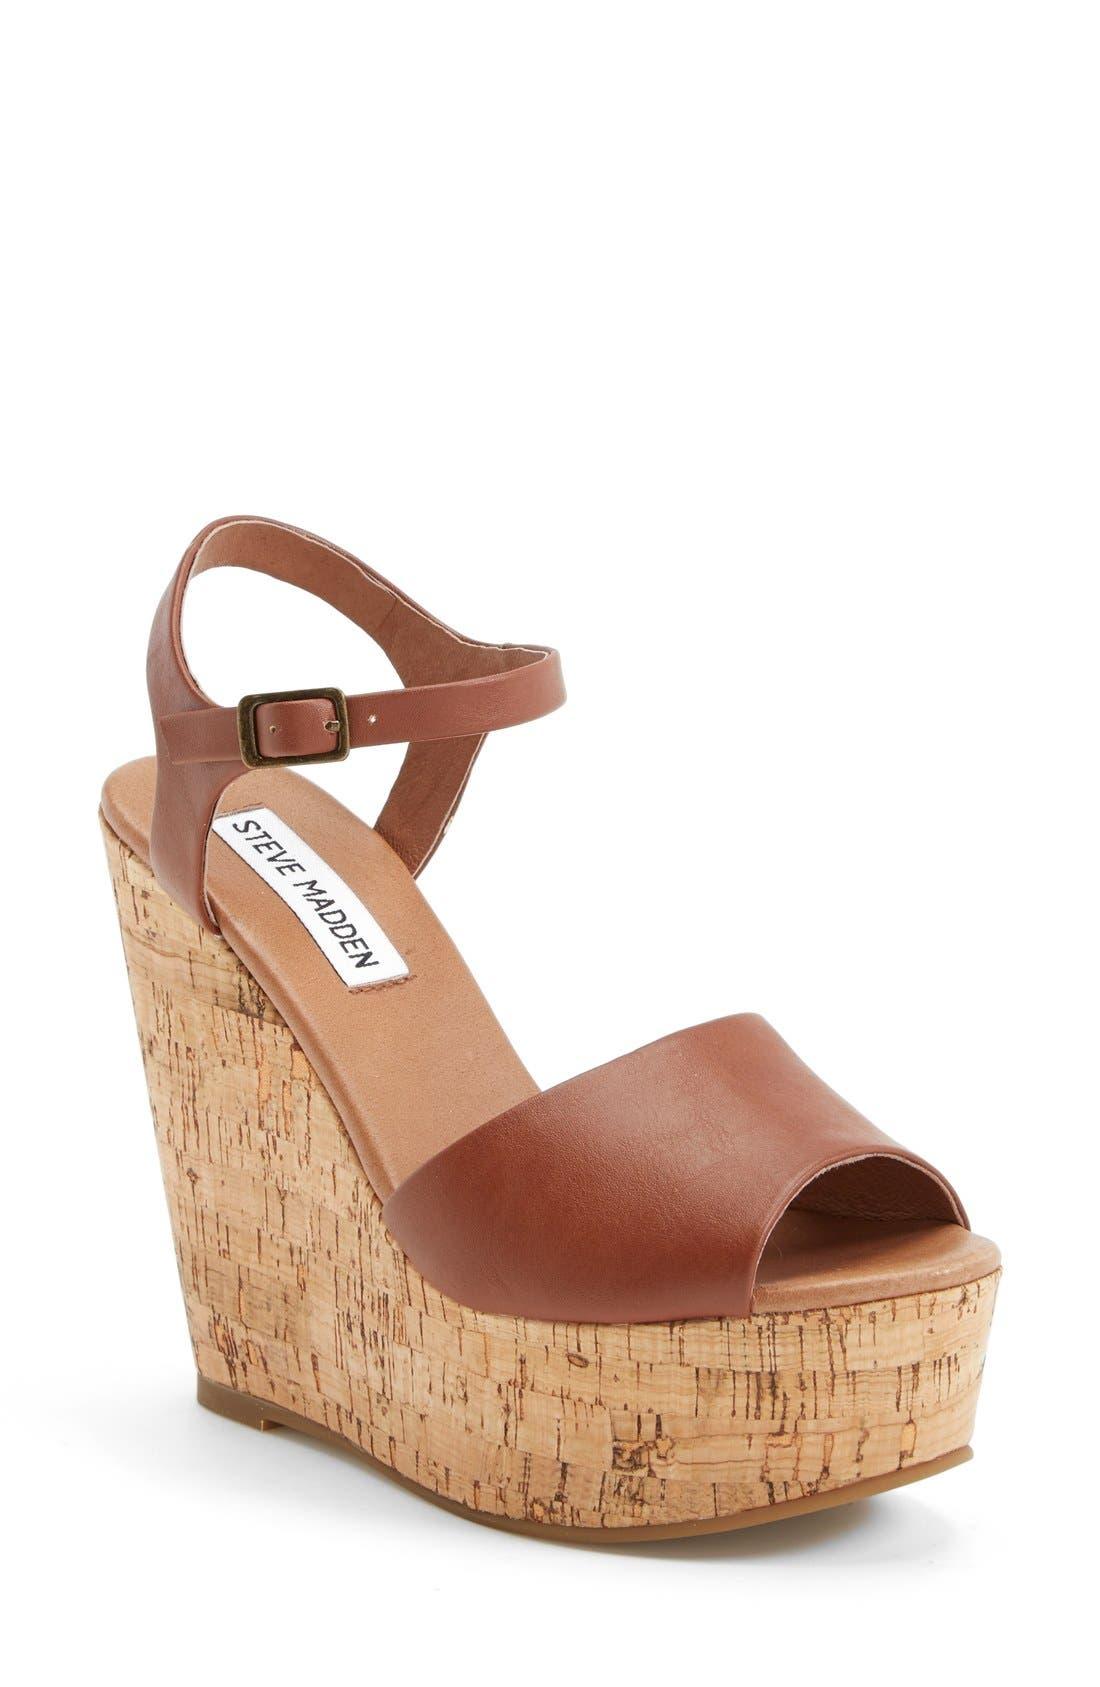 Main Image - Steve Madden 'Korkey' Ankle Strap Wedge Platform Sandal (Women)